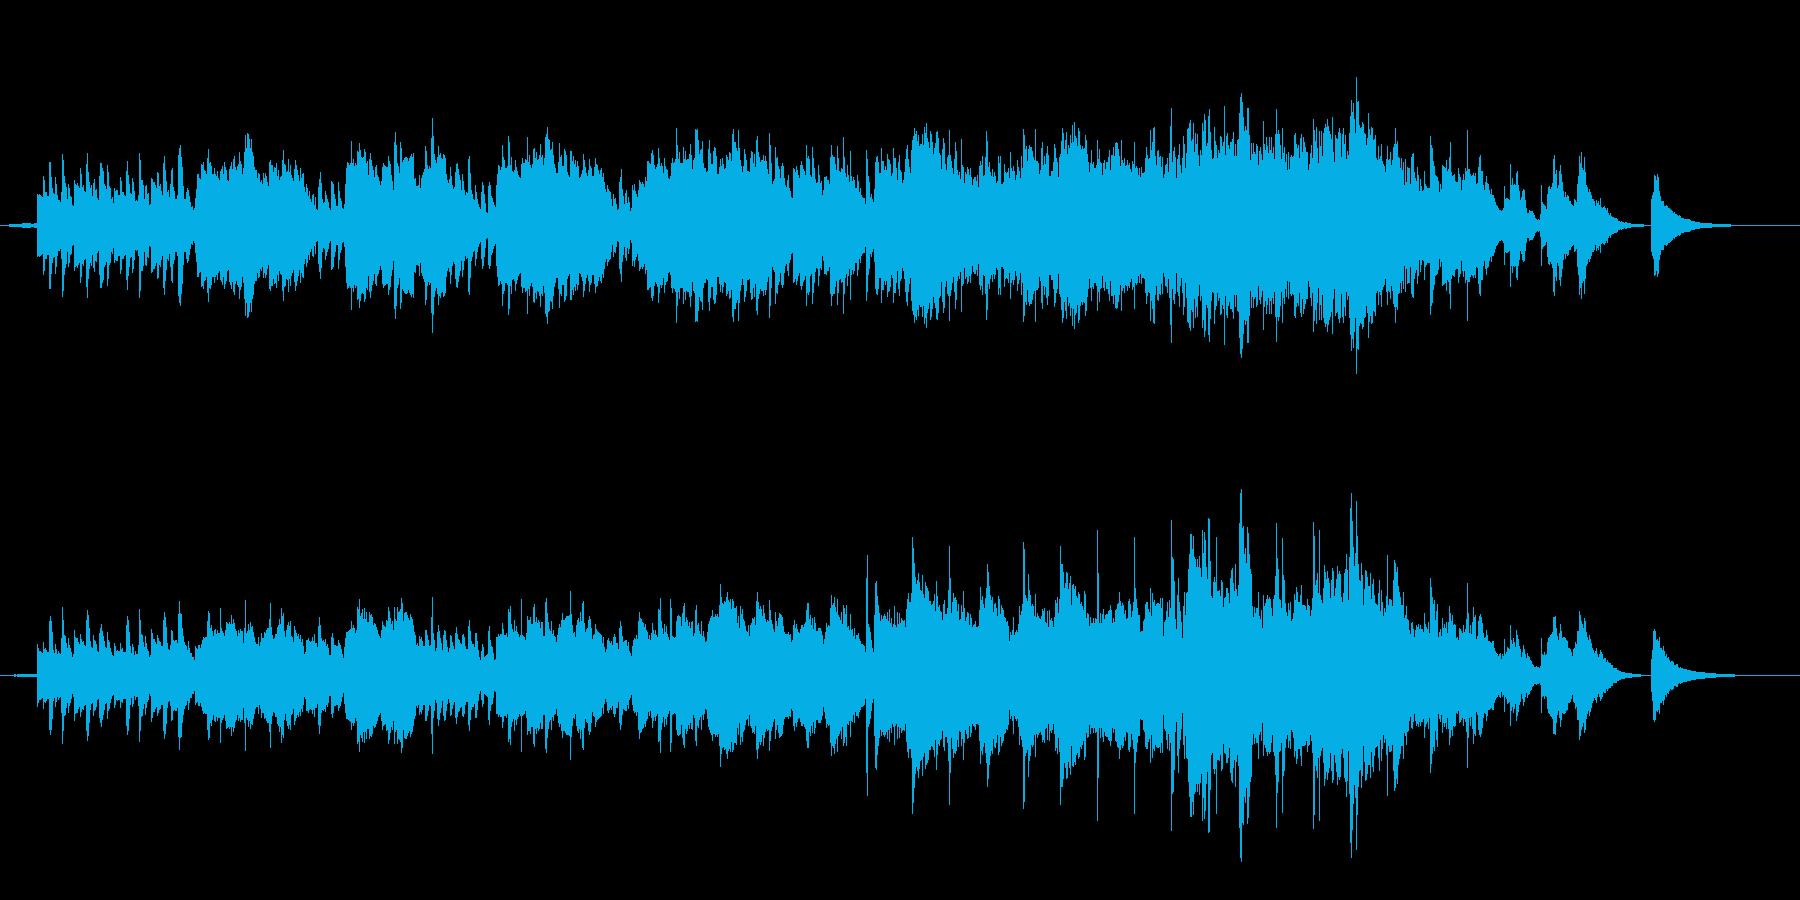 RPG:ダンジョン用BGM7の再生済みの波形